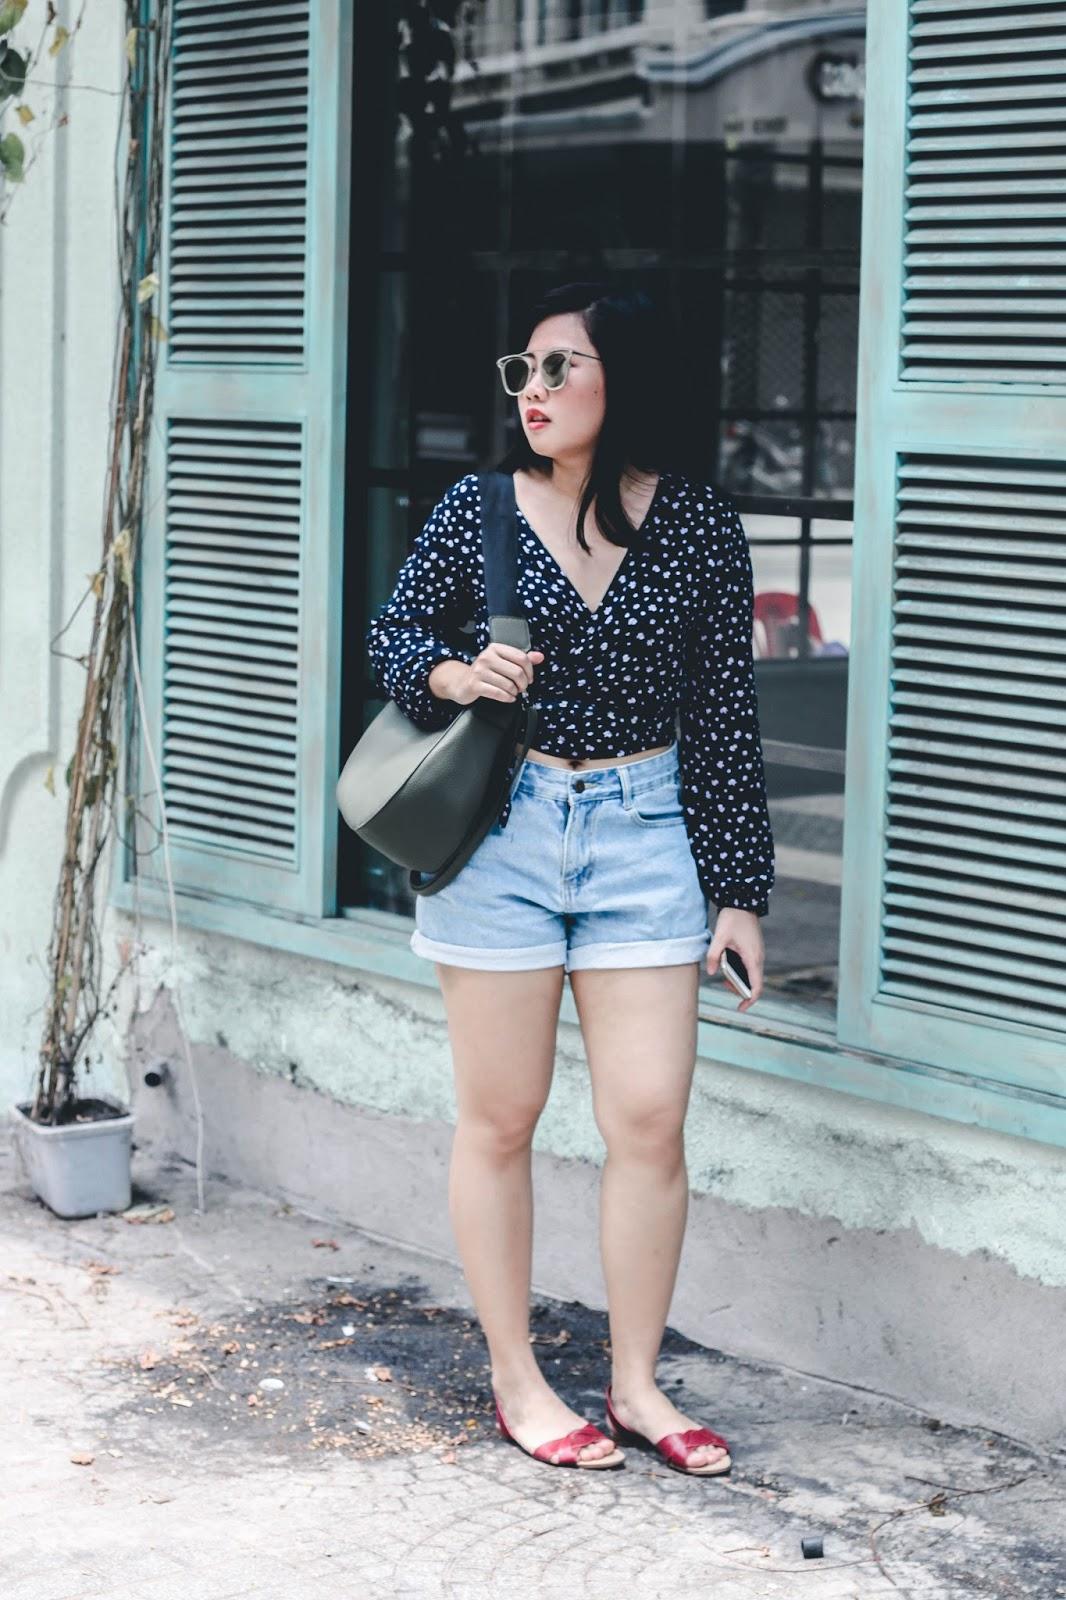 singapore blogger style stylist photographer street style look book fashion fashionista wiwt ootd stylexstyle denim the gentle monster shades saigon weekend trip vietnam inspiration